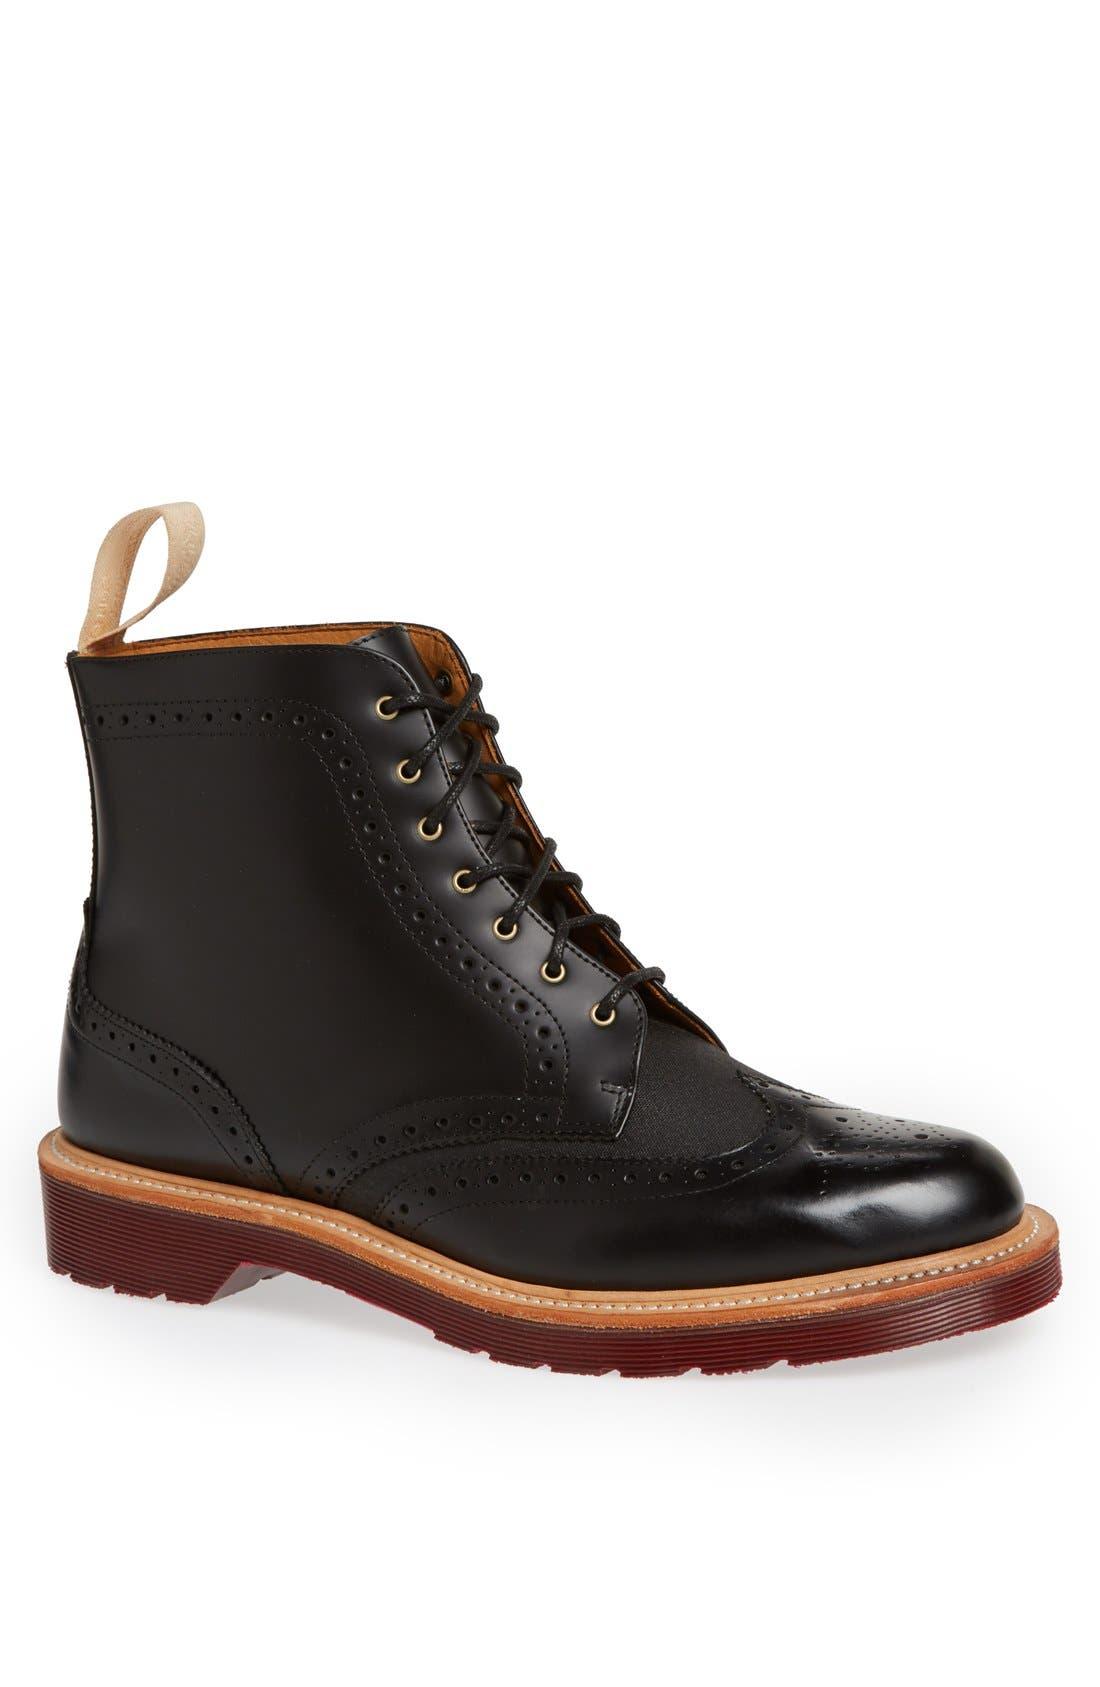 Alternate Image 1 Selected - Dr. Martens 'Bentley' Boot